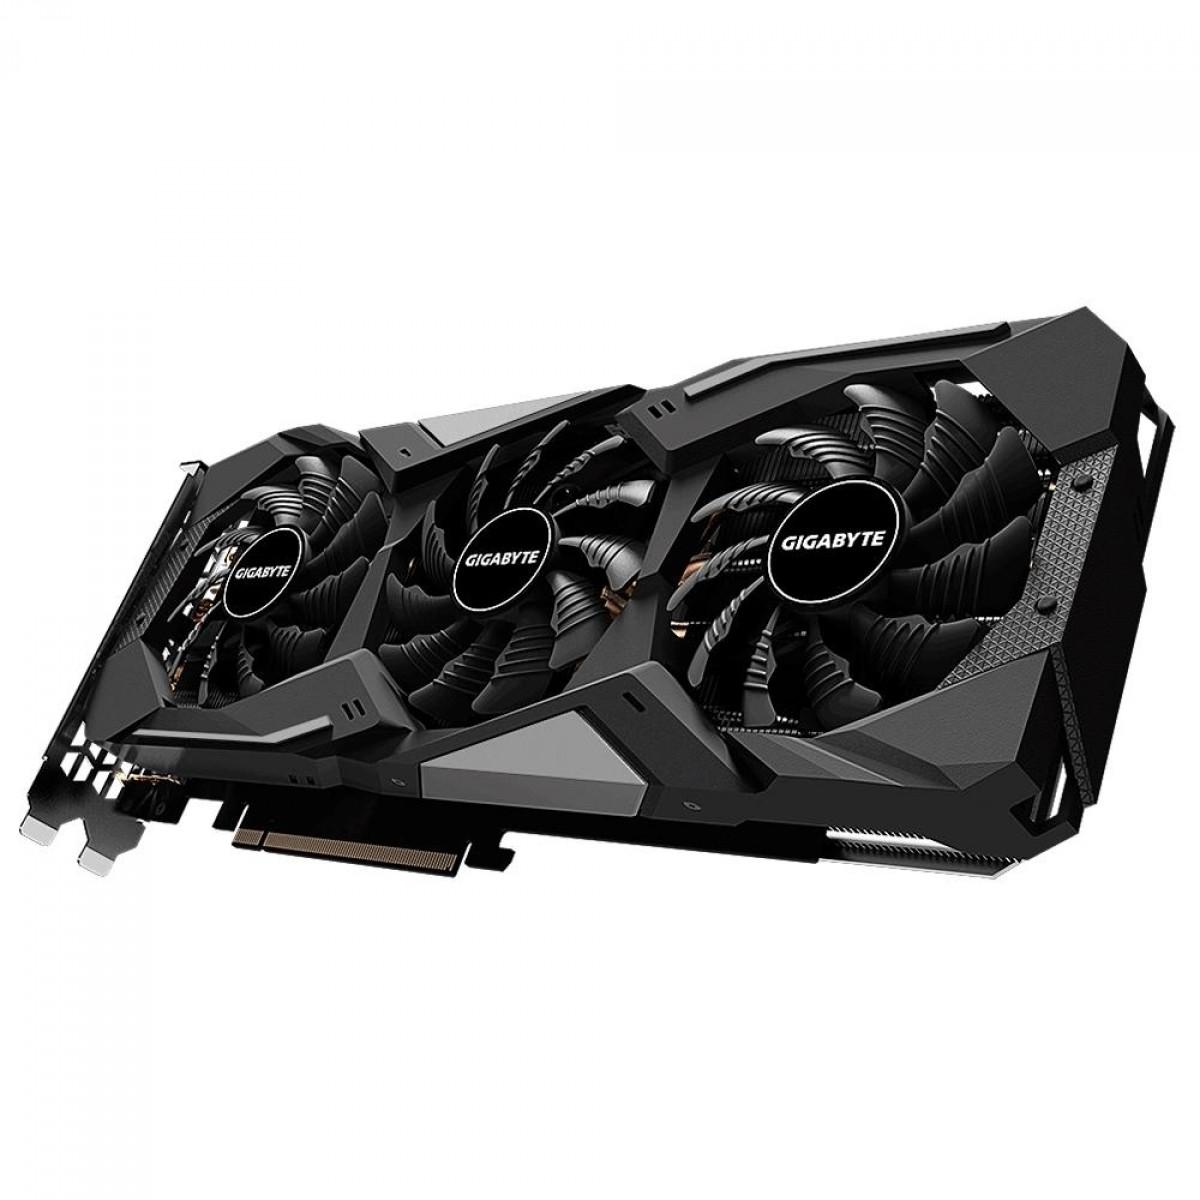 Placa de Vídeo Gigabyte Geforce RTX 2060 Gaming OC, 6GB GDDR6, 192Bit, GV-N2060GAMINGOC PRO-6GD R2